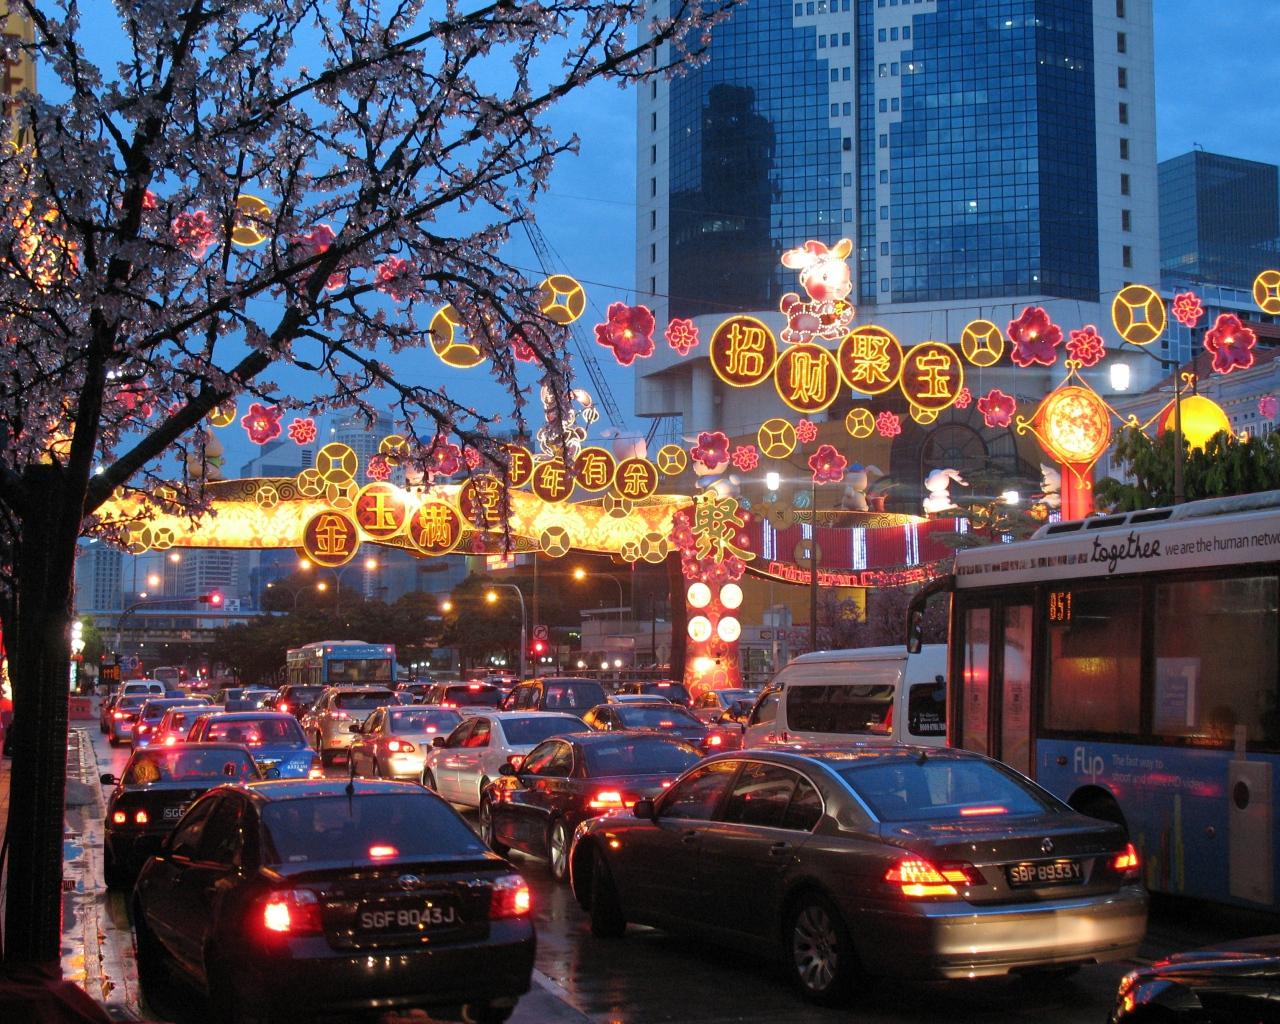 singapore_holiday_chinatown_cork_city_new_year_62007_1280x1024